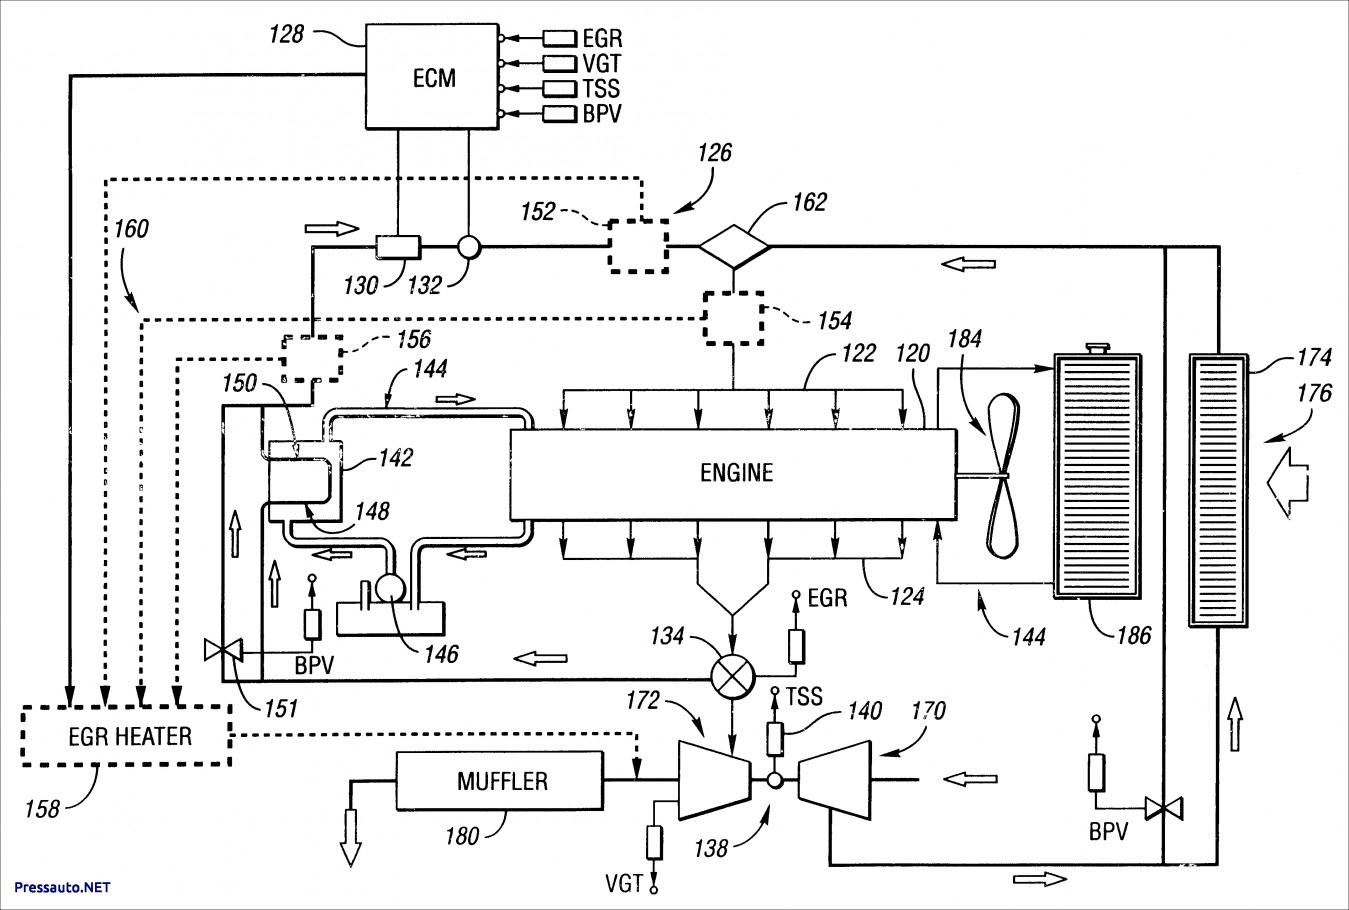 Honda Gx390 Electrical Schematic - Wiring Diagram Explained - Honda Gx390 Wiring Diagram